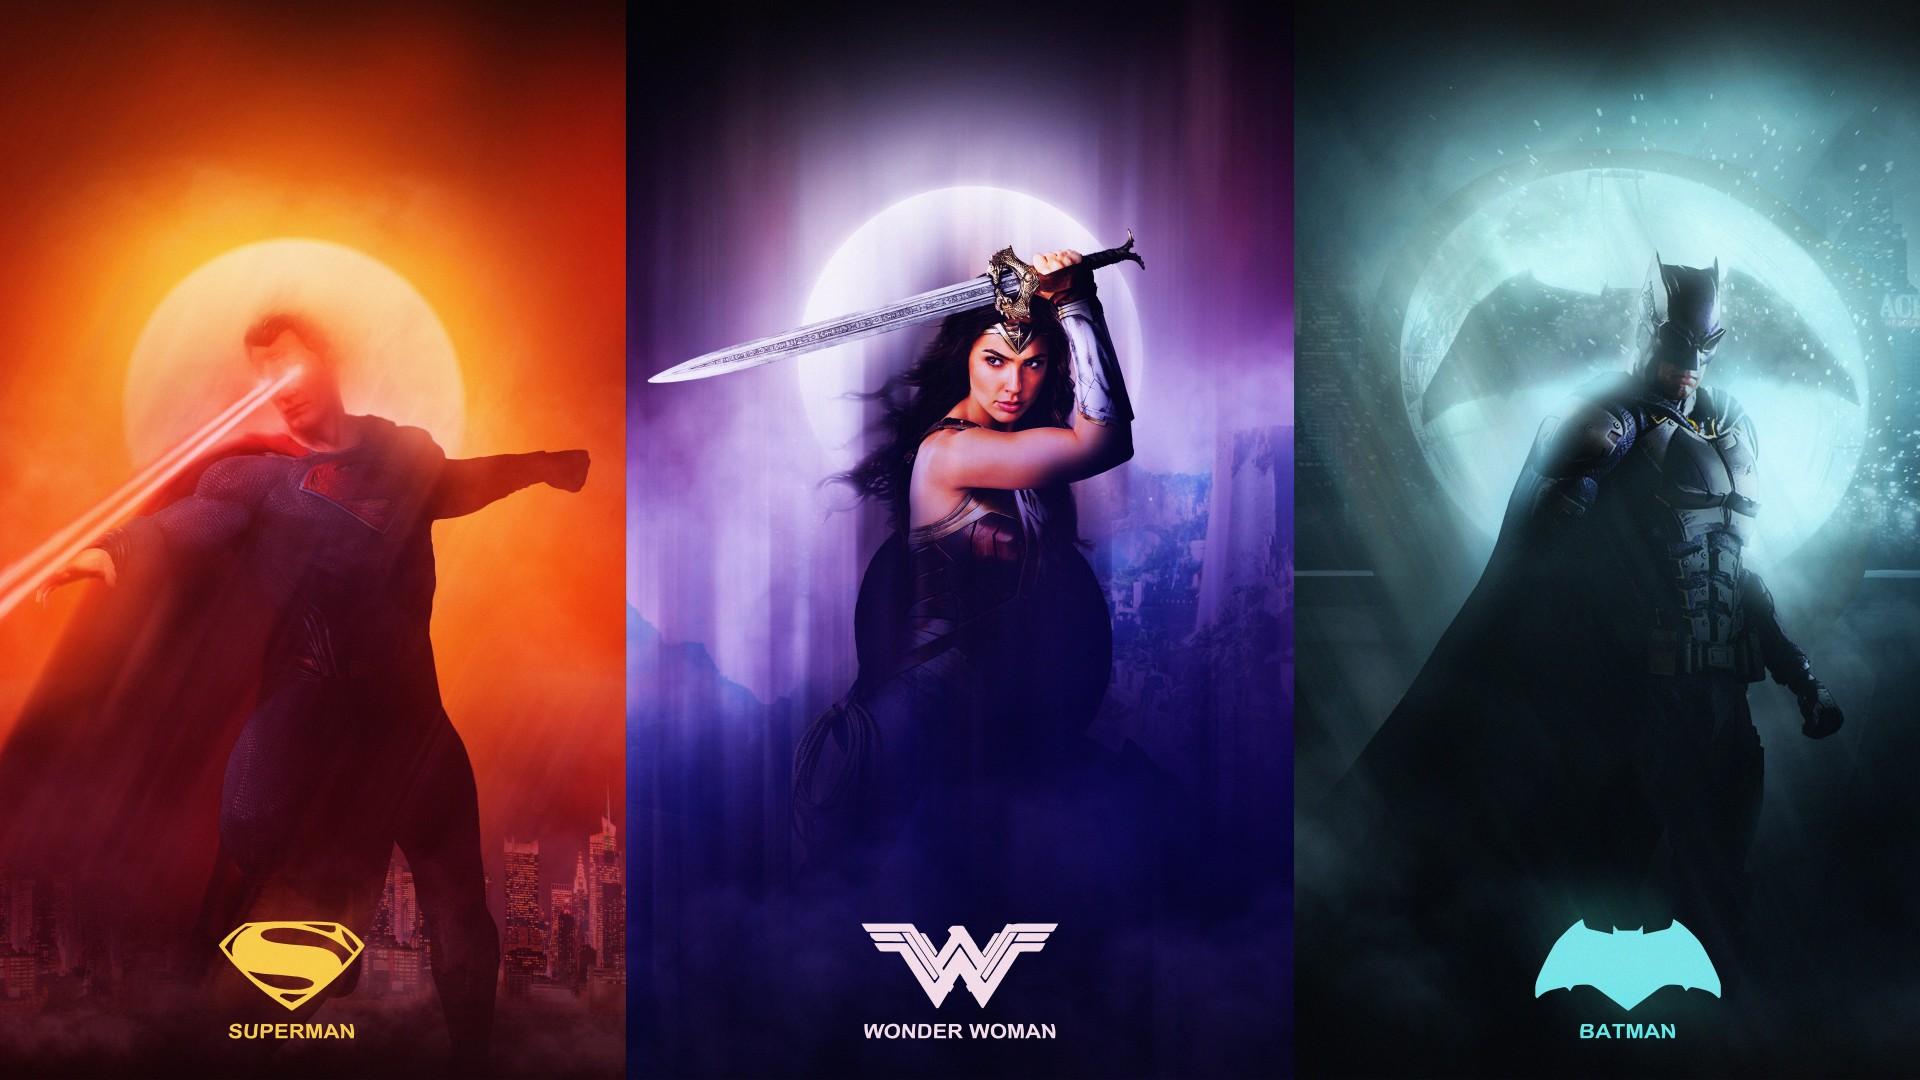 Wallpaper Hd Iphone Cute Men Justice League Superman Wonder Woman Batman 4k 8k